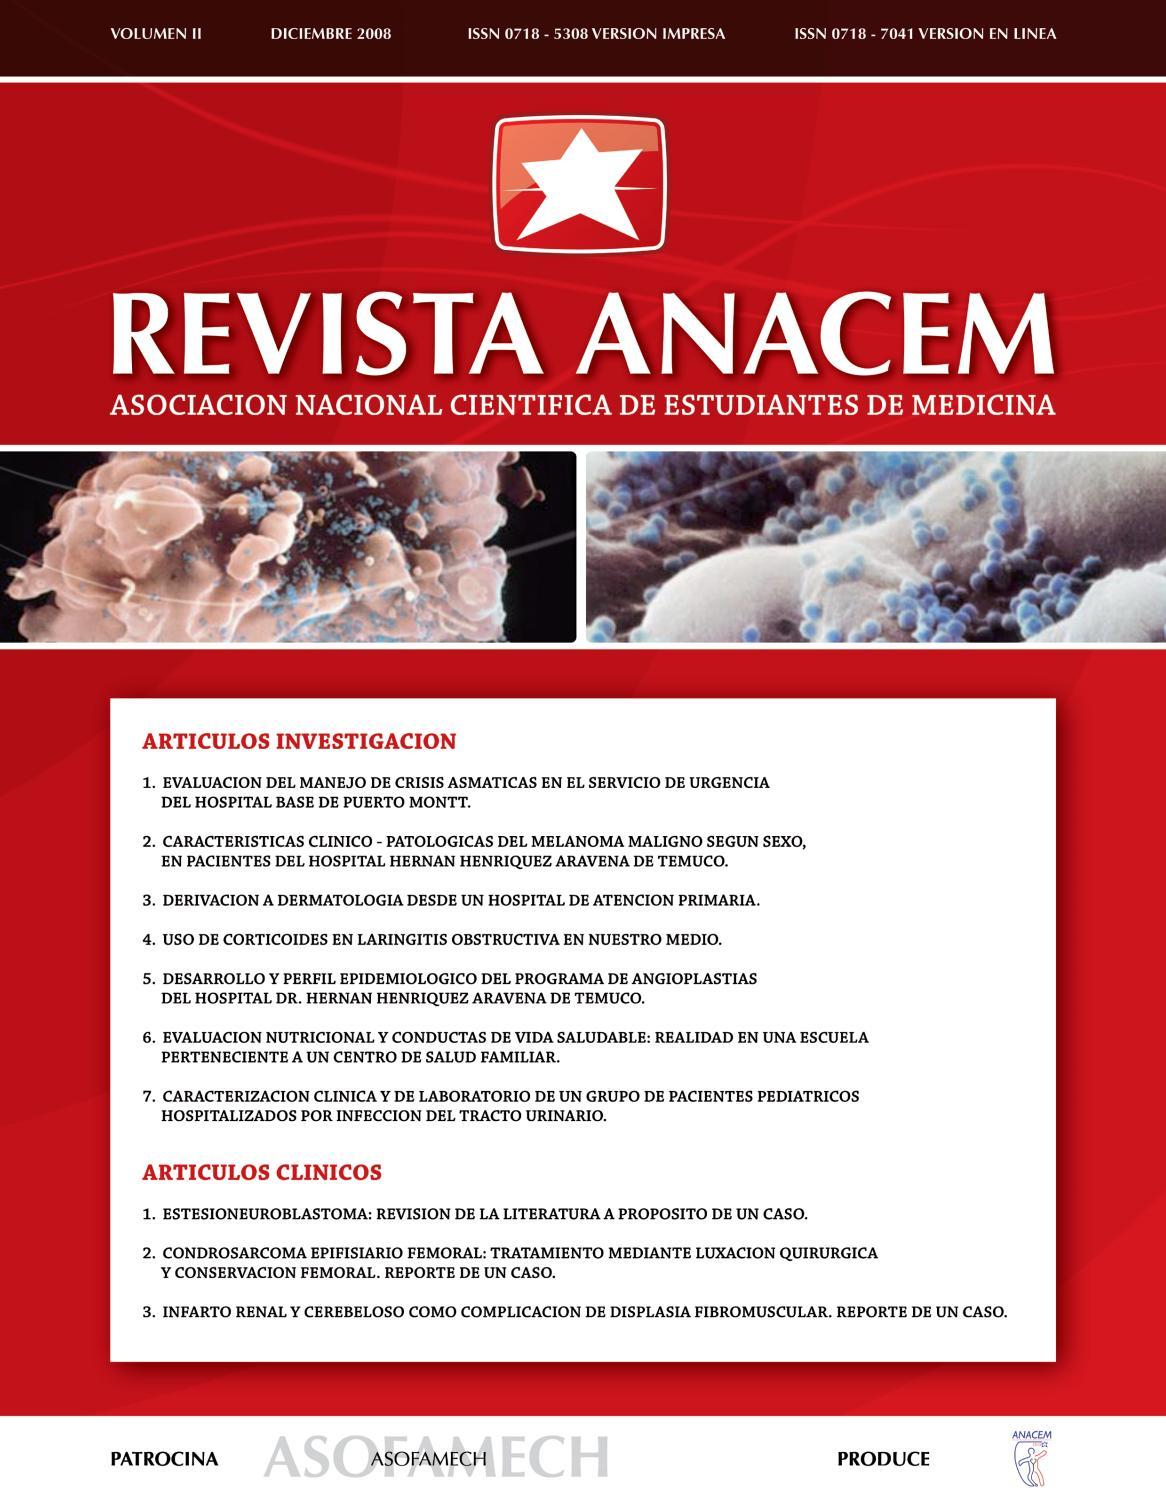 Revista ANACEM 2008;2(1) by REVISTA ANACEM - issuu